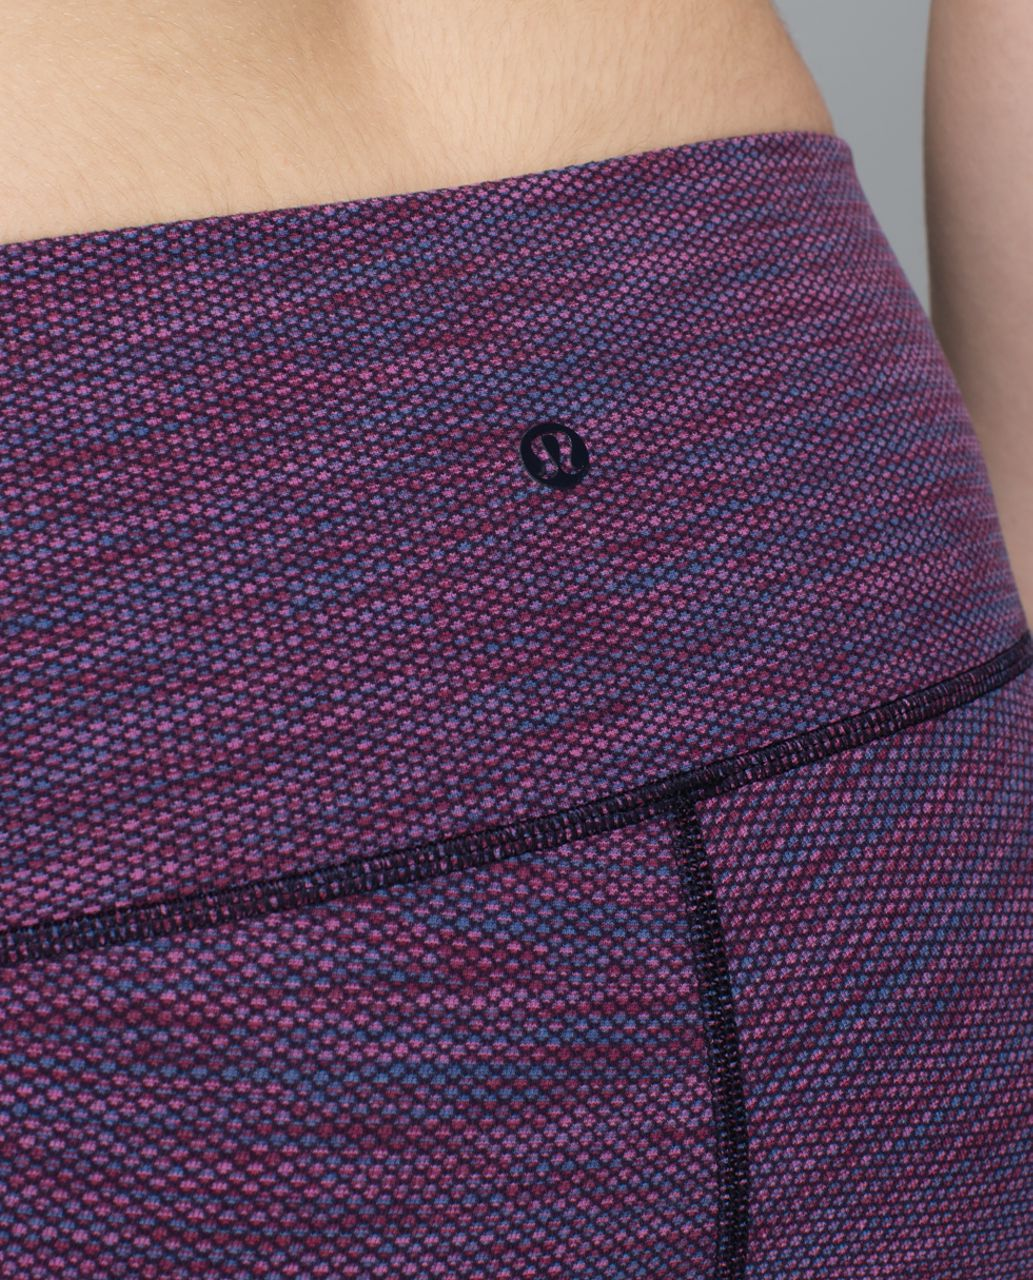 Lululemon High Times Pant - Diamond Jacquard Space Dye Naval Blue Jewelled Magenta